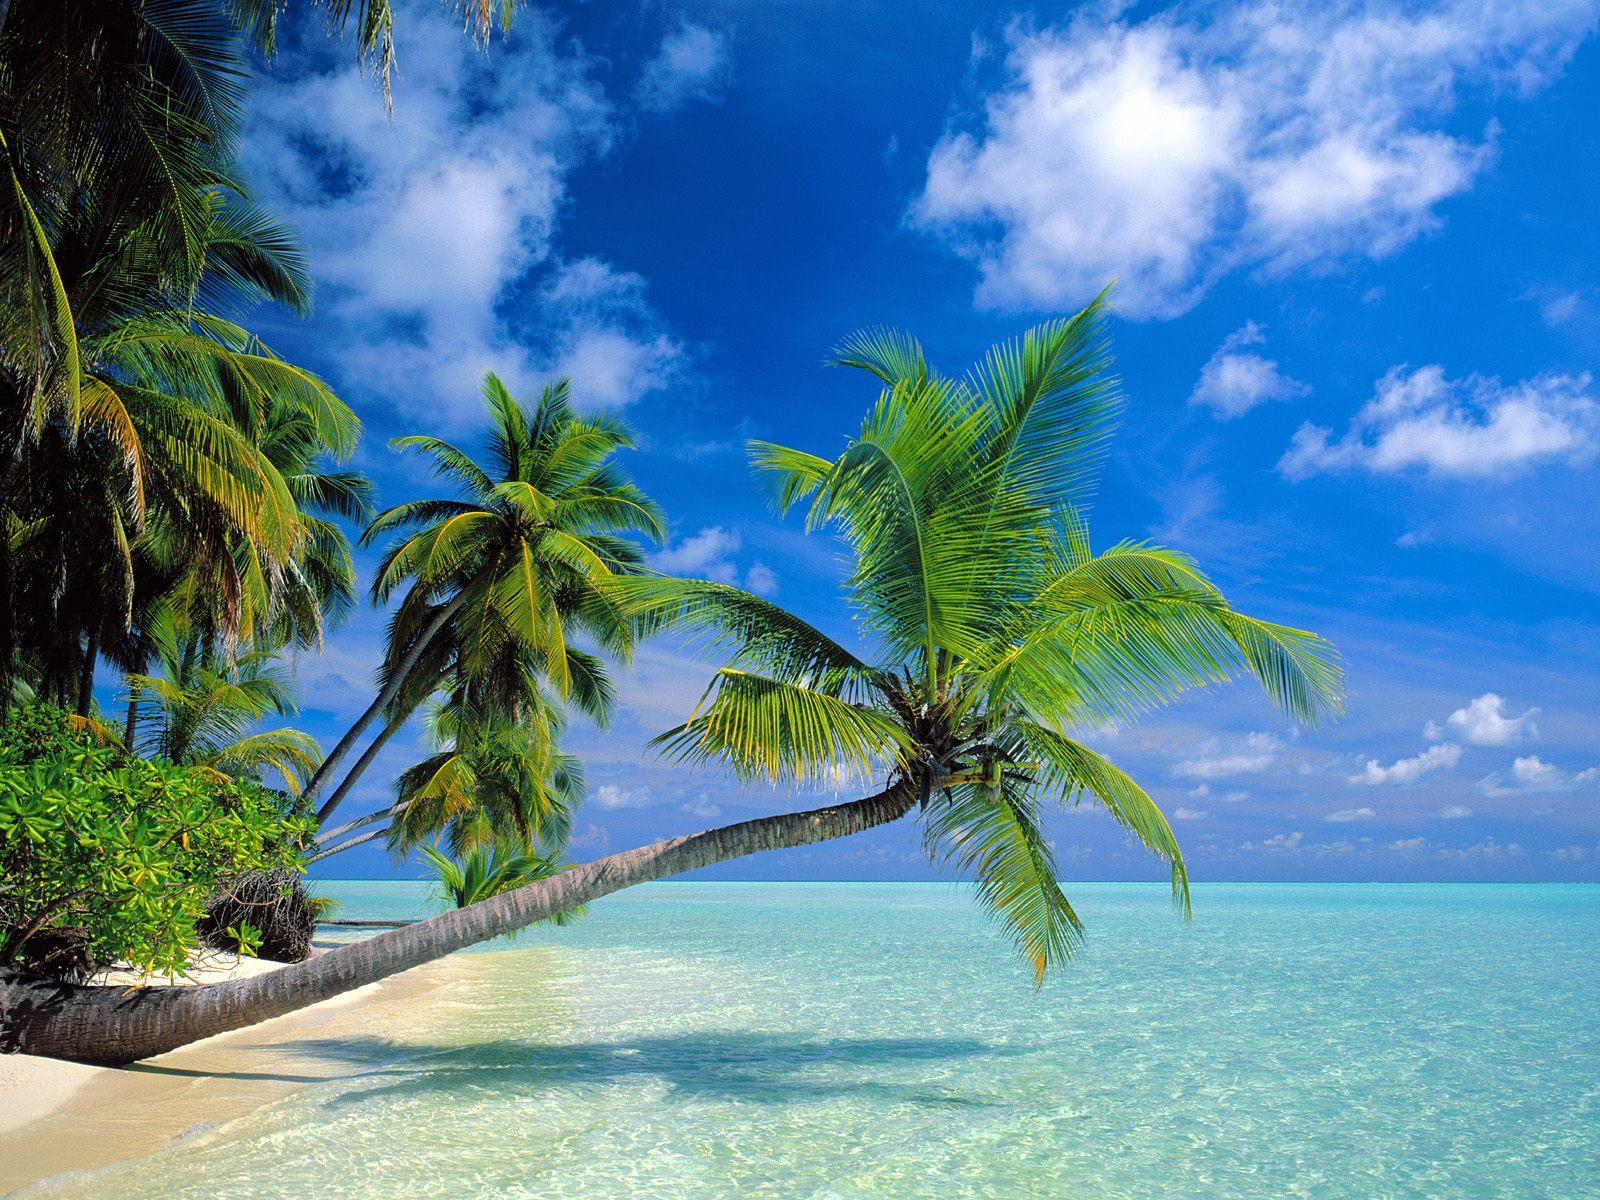 Beautiful Beach   Wallpaper 11010 1600x1200